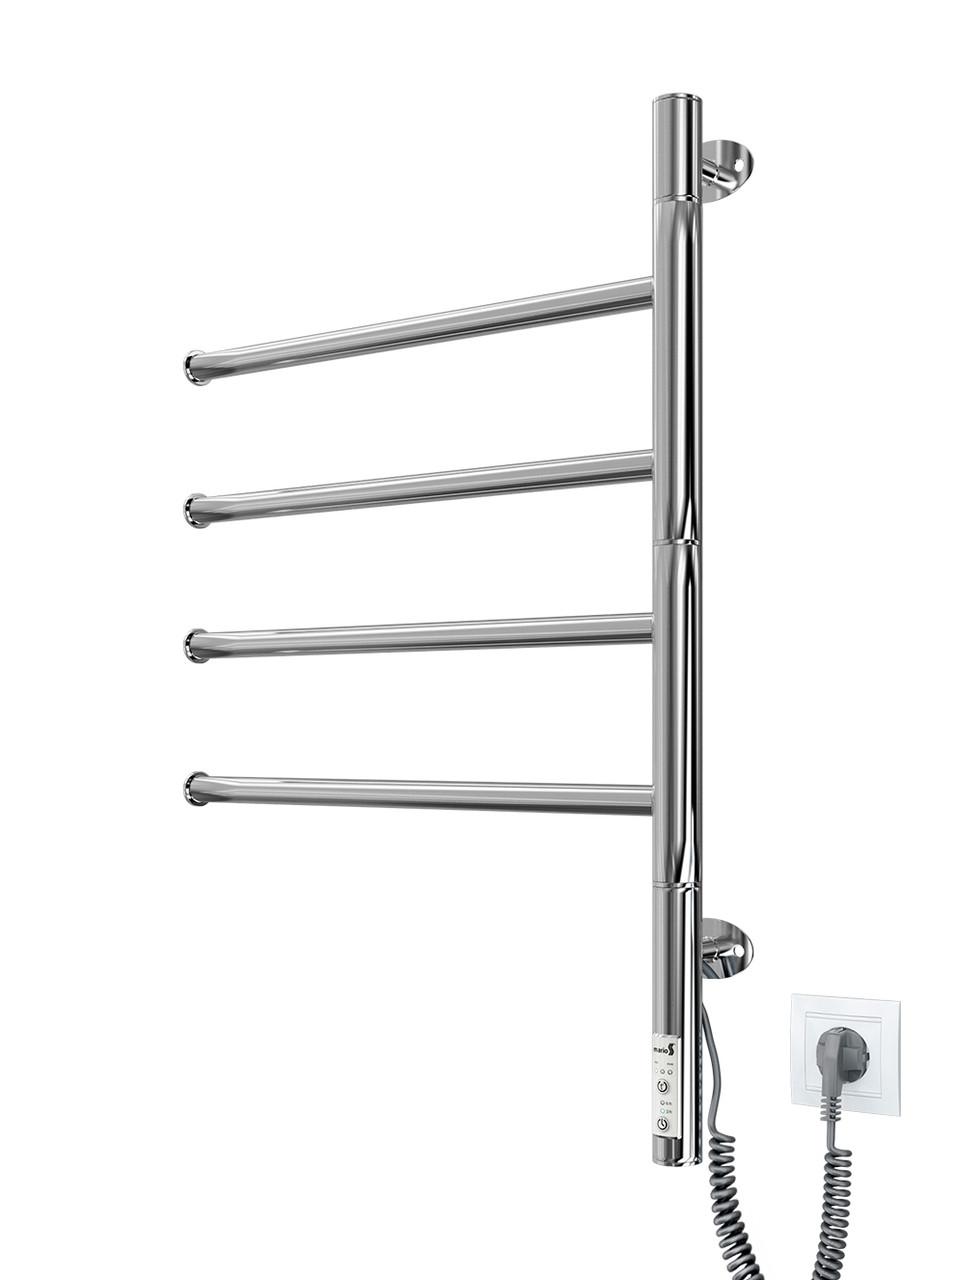 Электрический полотенцесушитель Mario Веер -I 600х445 TR таймер-регулятор